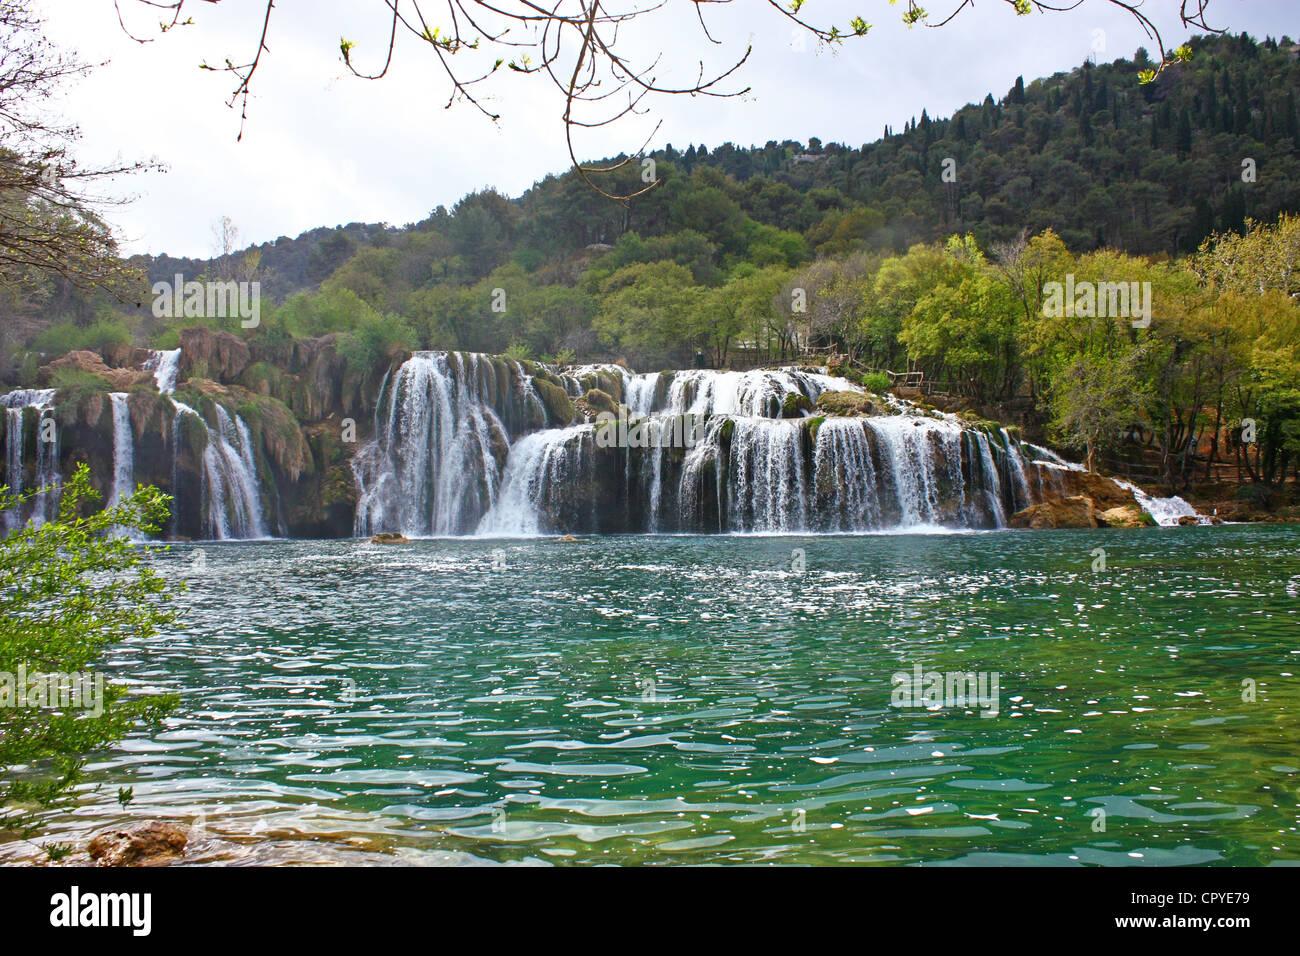 National park Krka, waterfall on Krka river, Croatia Stock Photo